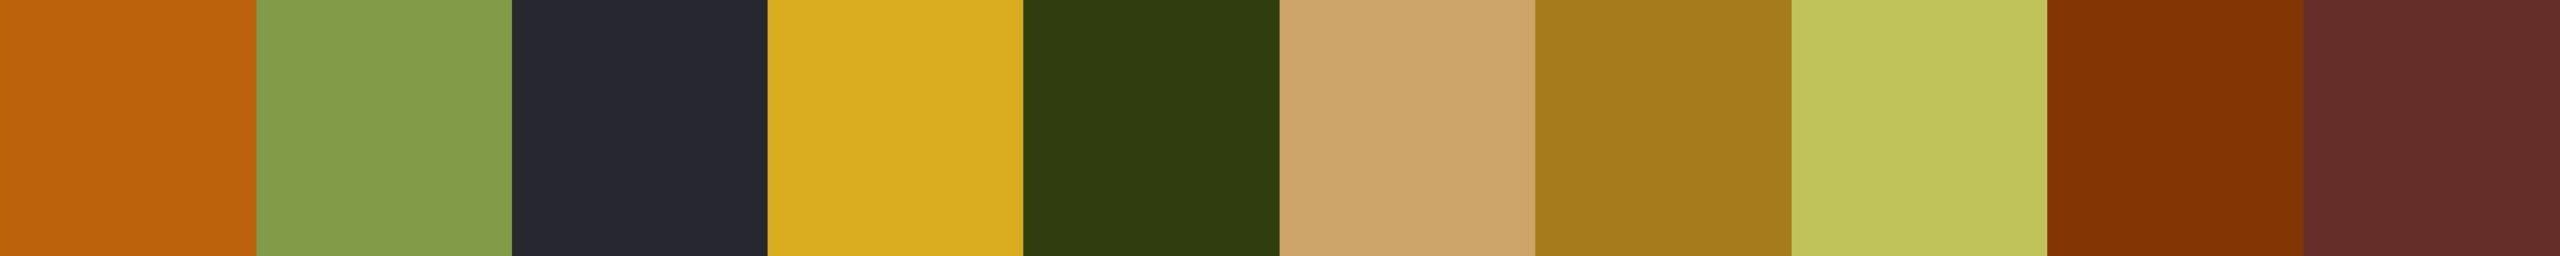 494 Leveredia Color Palette